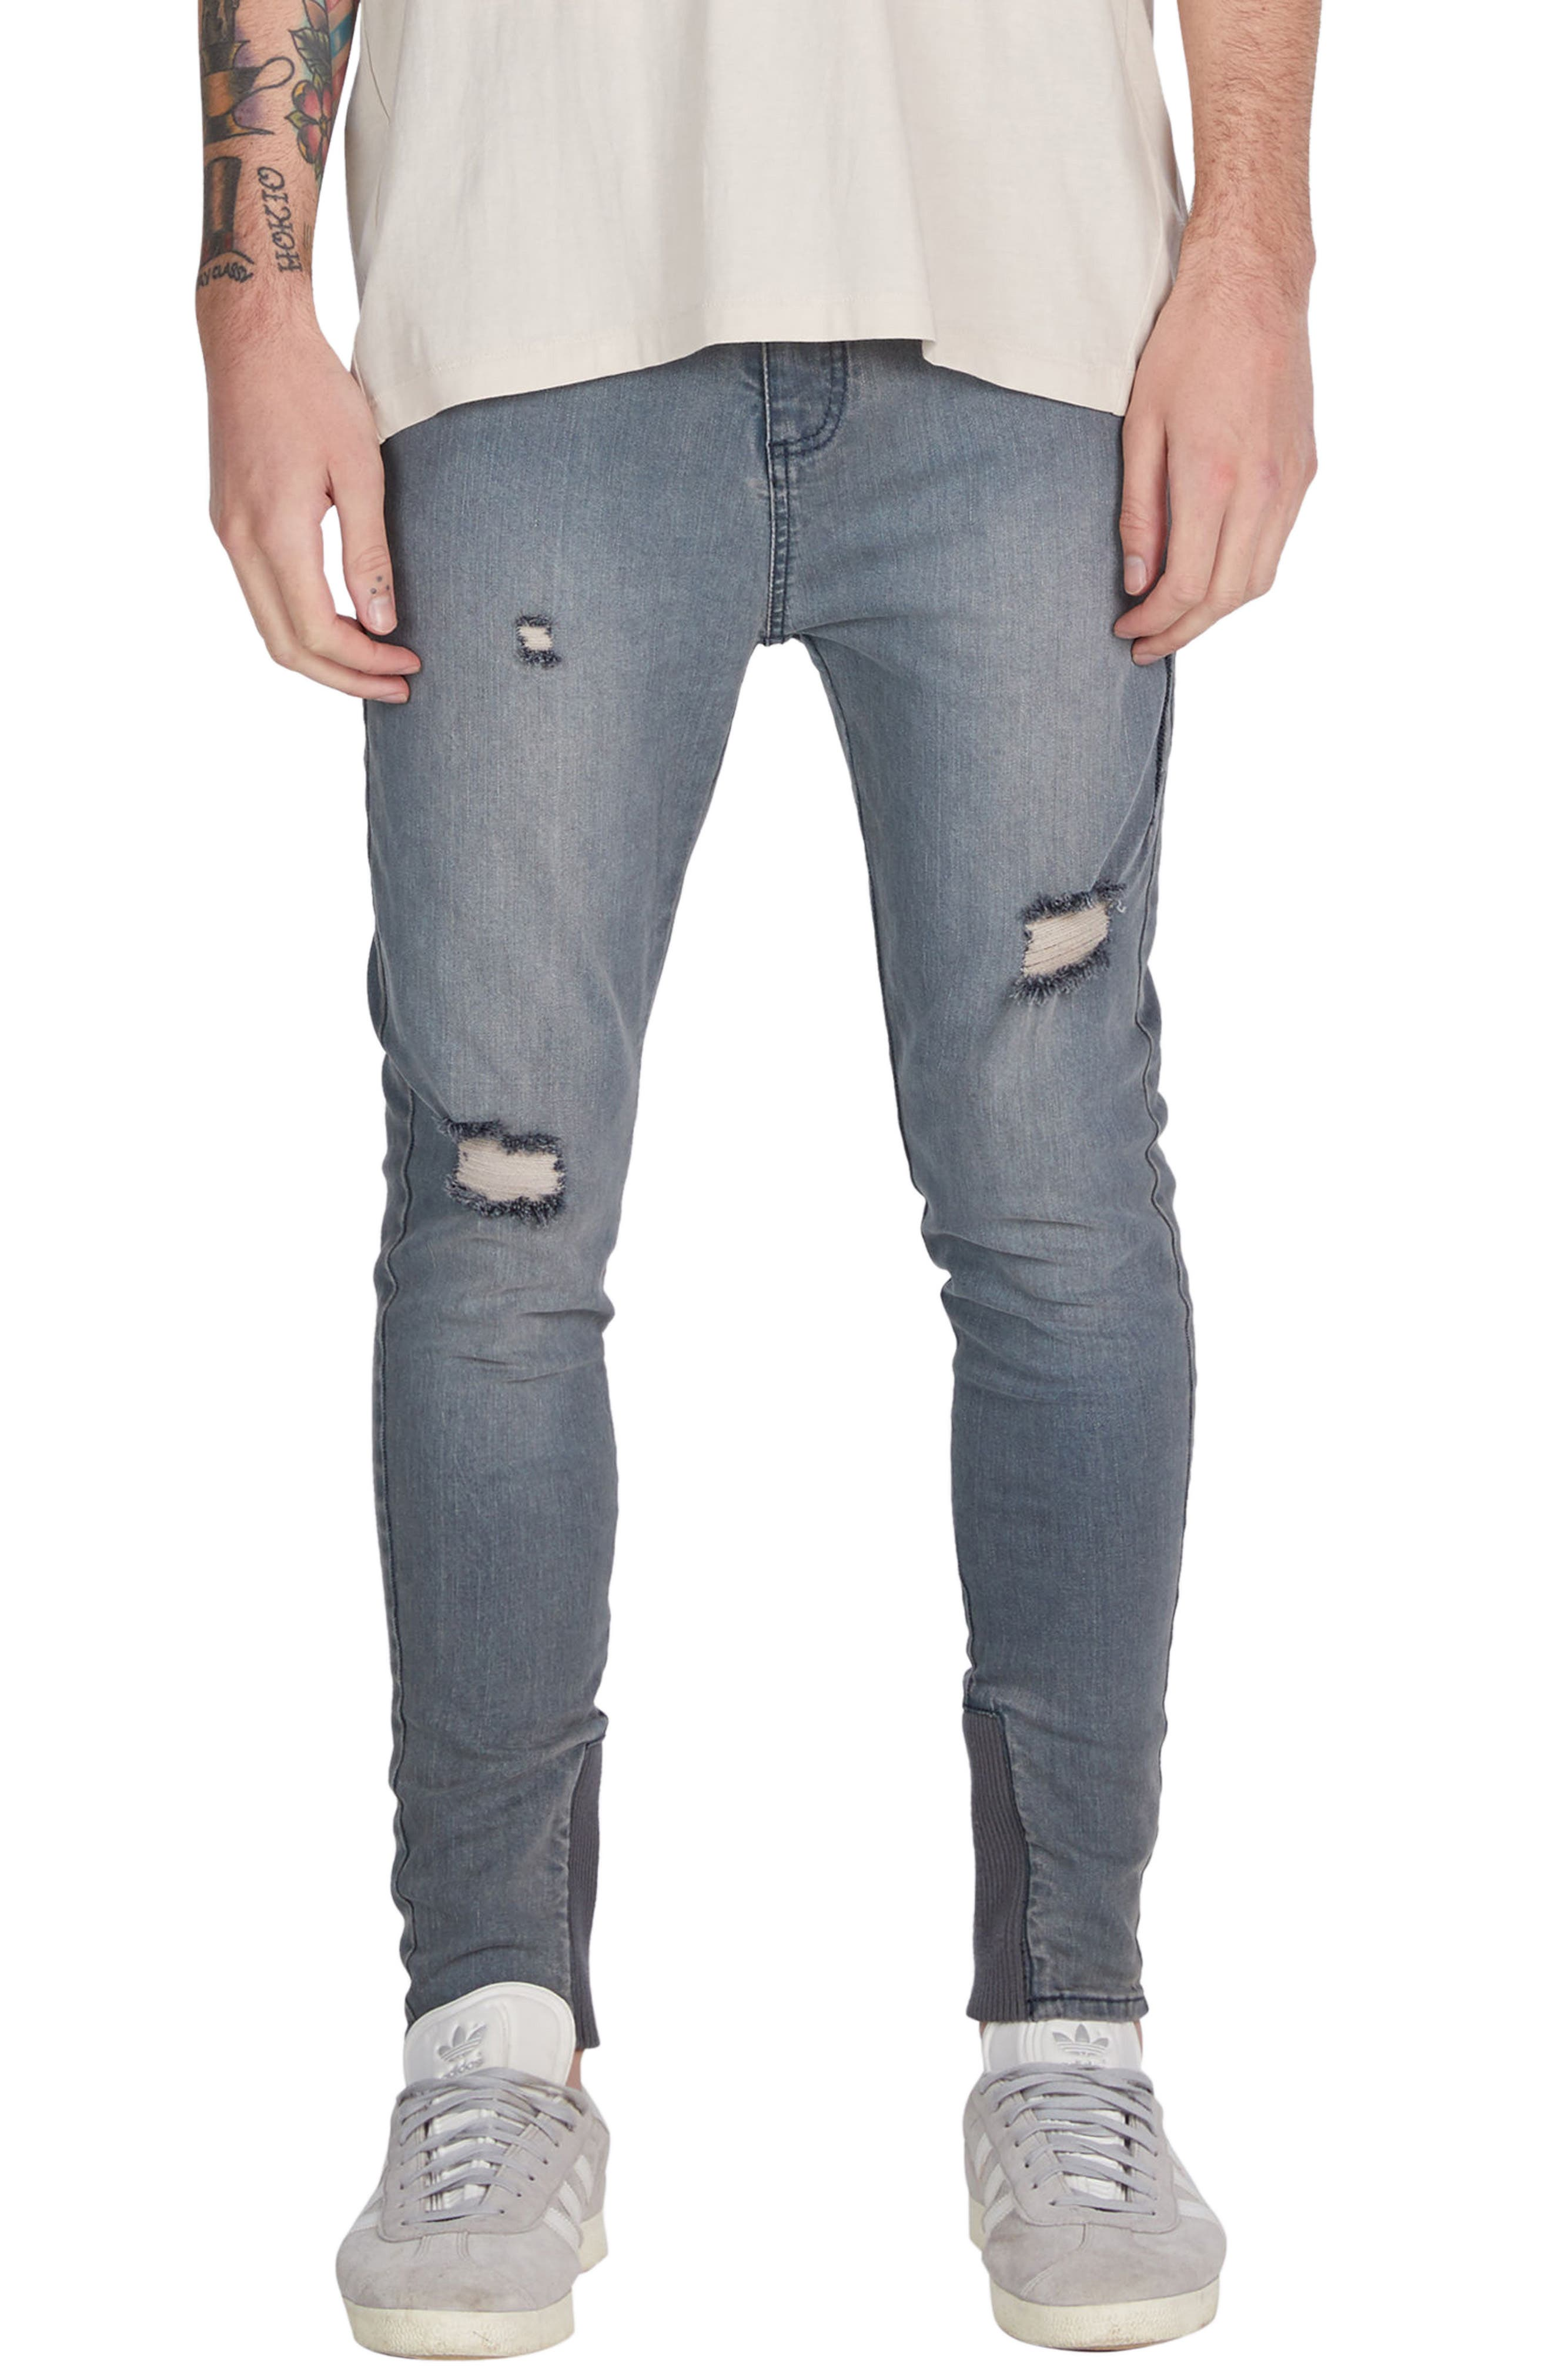 Sharpshot Slouchy Skinny Fit Denim Pants,                         Main,                         color, Blue Grey